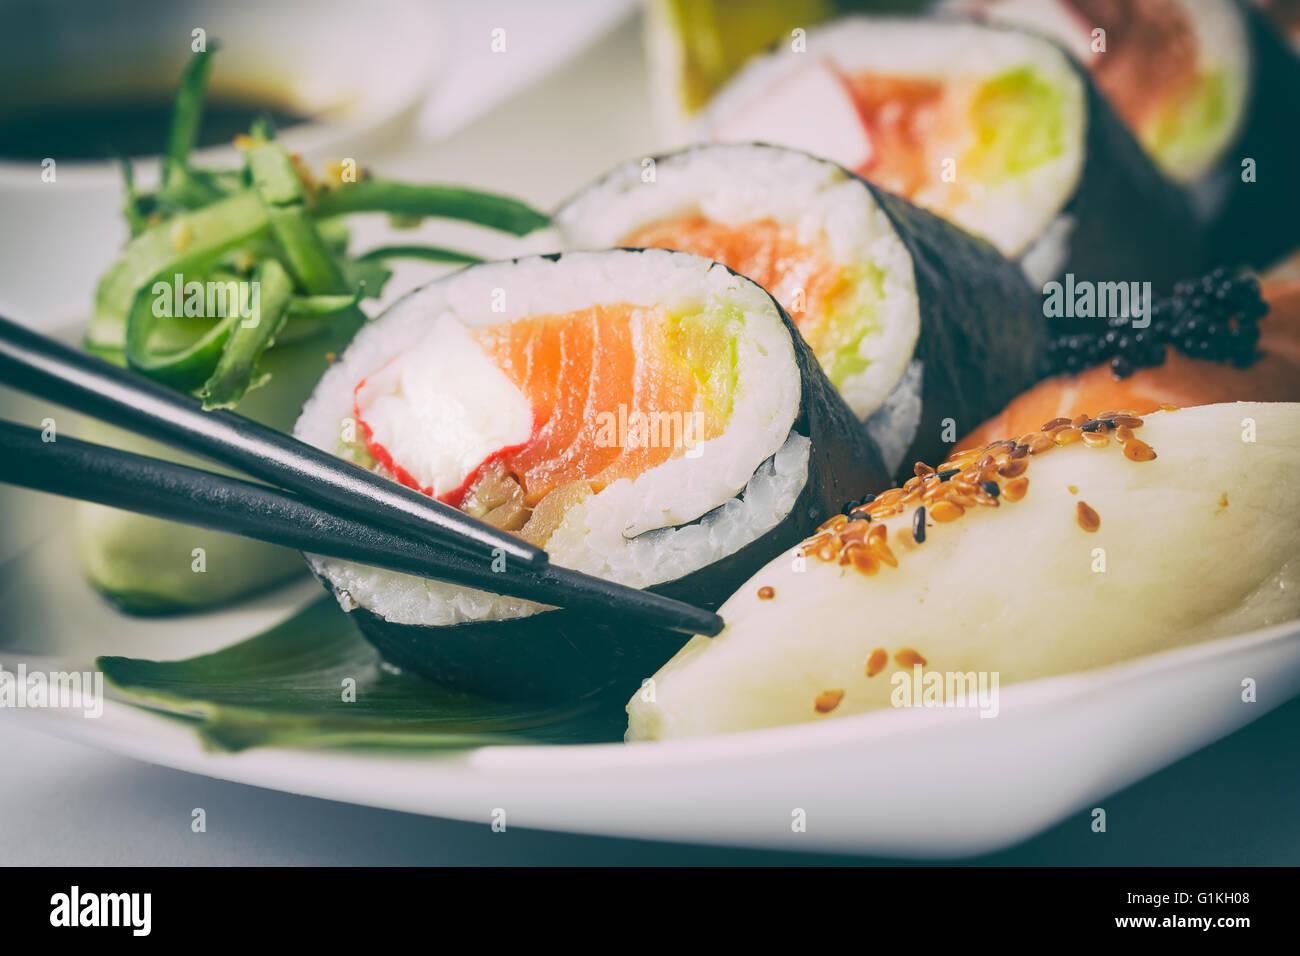 Sushi Roll materias makki alimentos frescos mariscos susi - stock image Foto de stock